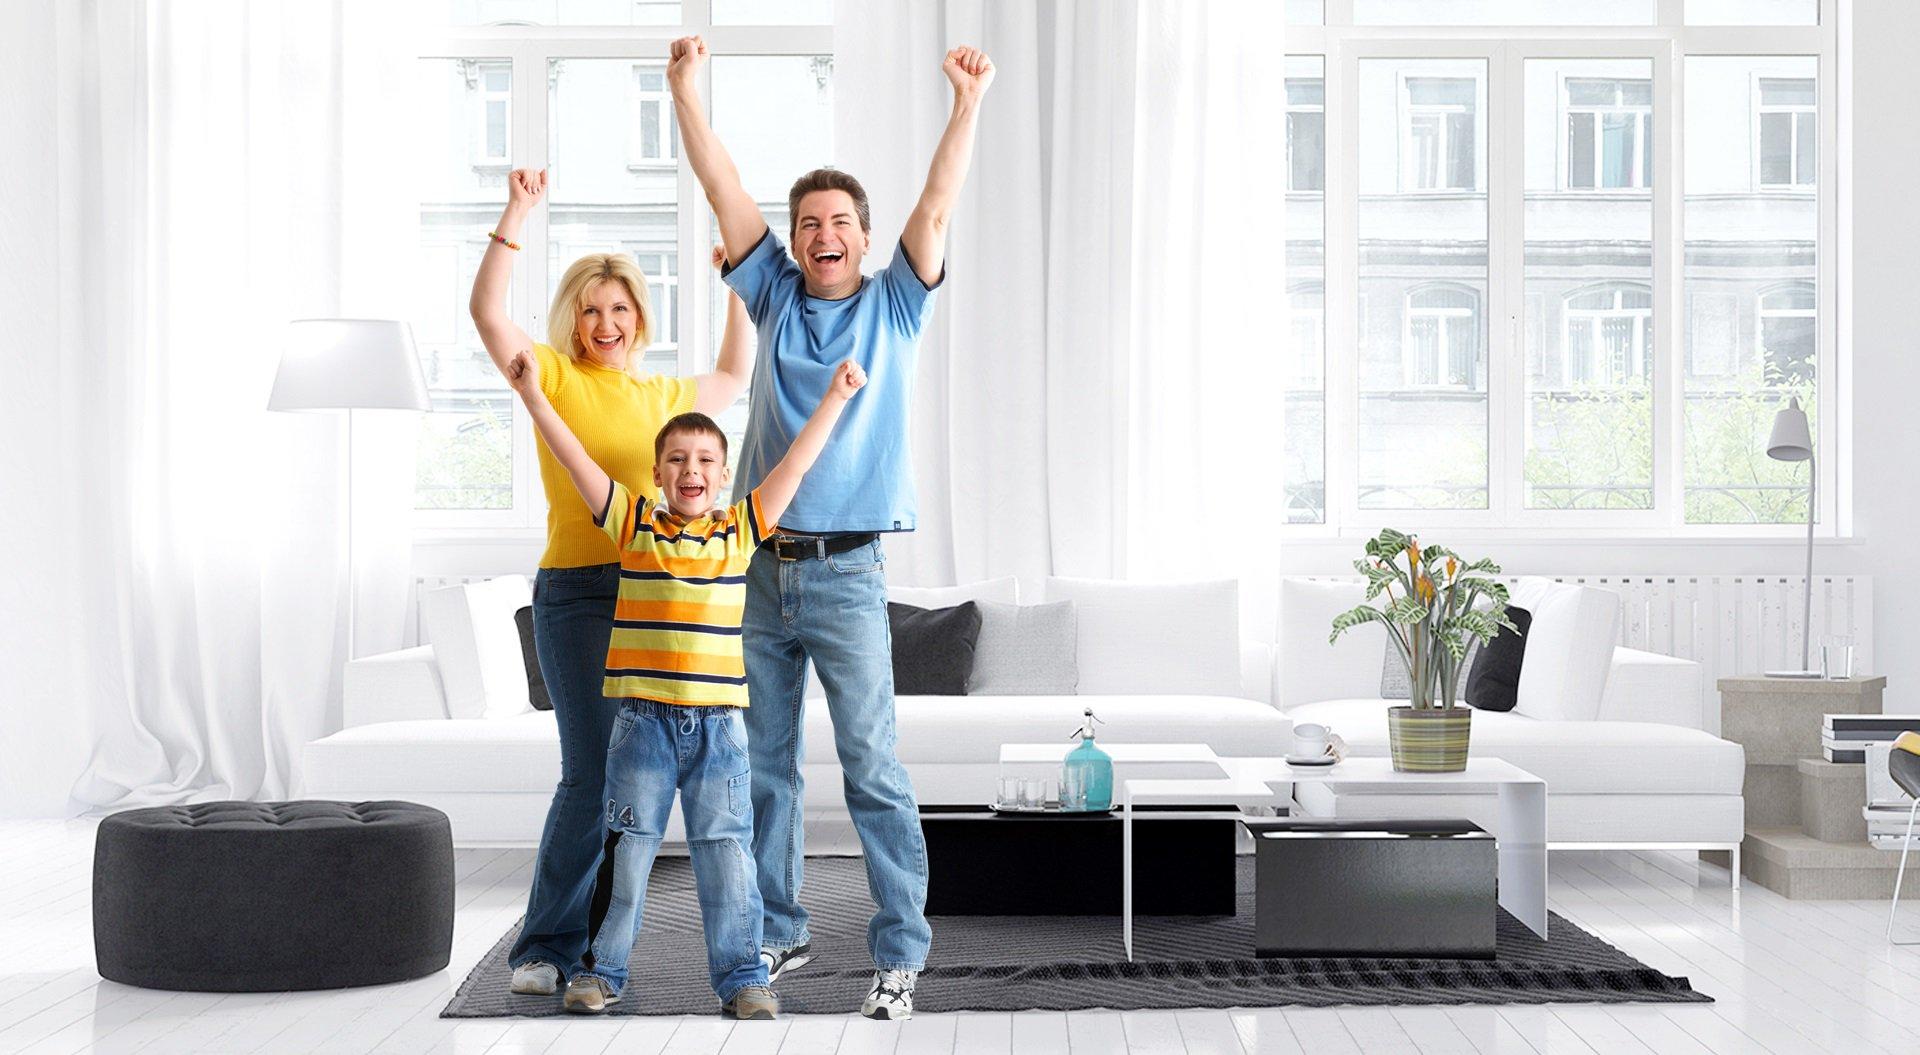 например, ремонт квартиры реклама картинка является